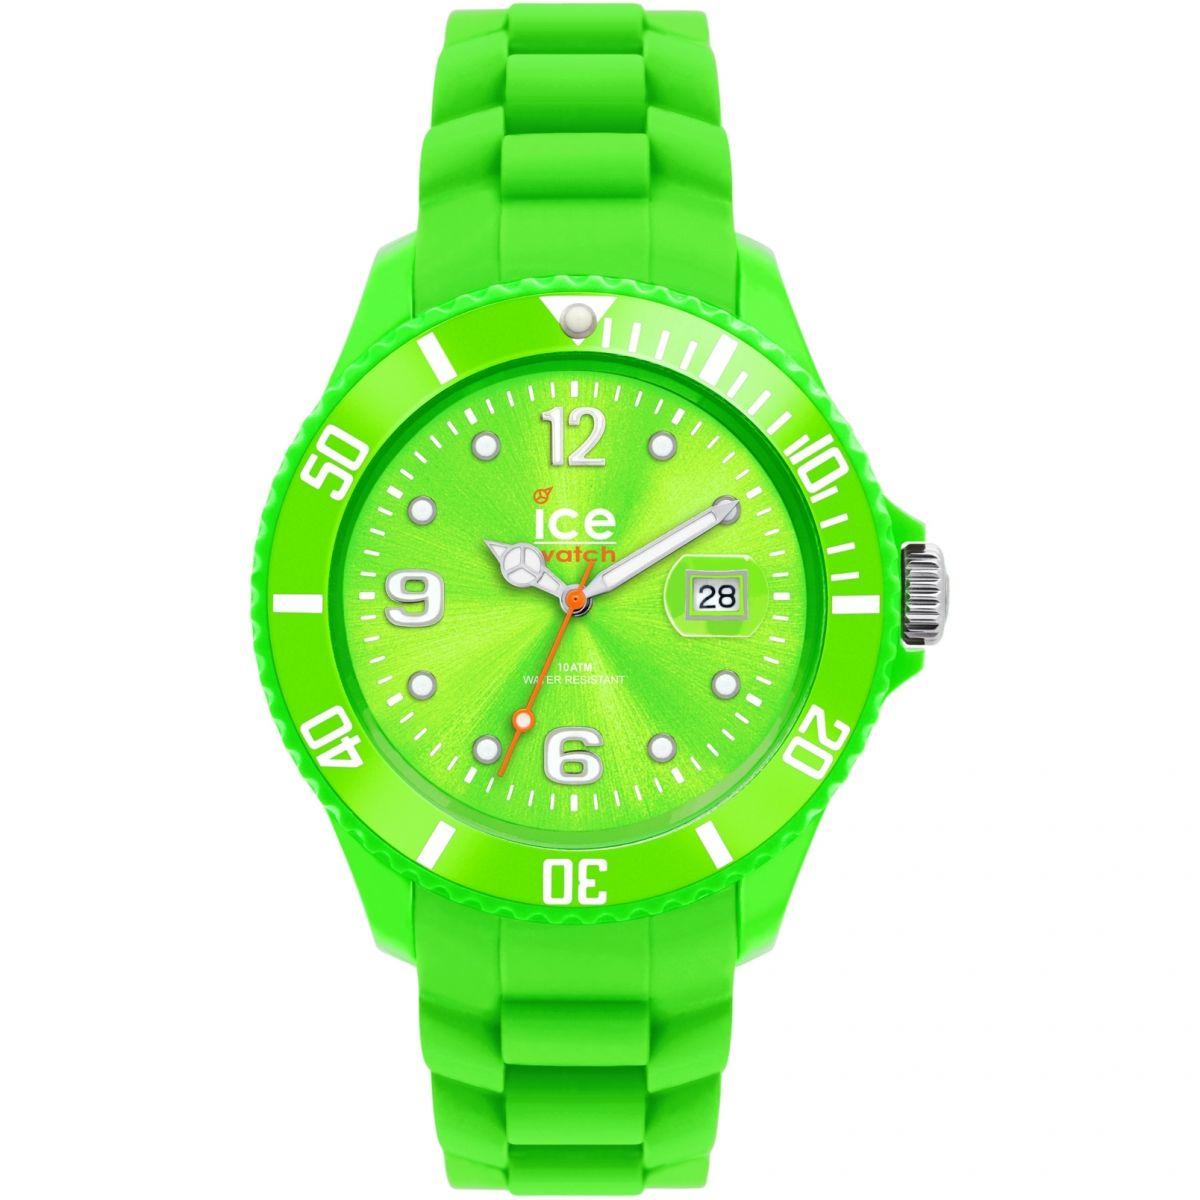 damen ice watch sili green small uhren 000126. Black Bedroom Furniture Sets. Home Design Ideas